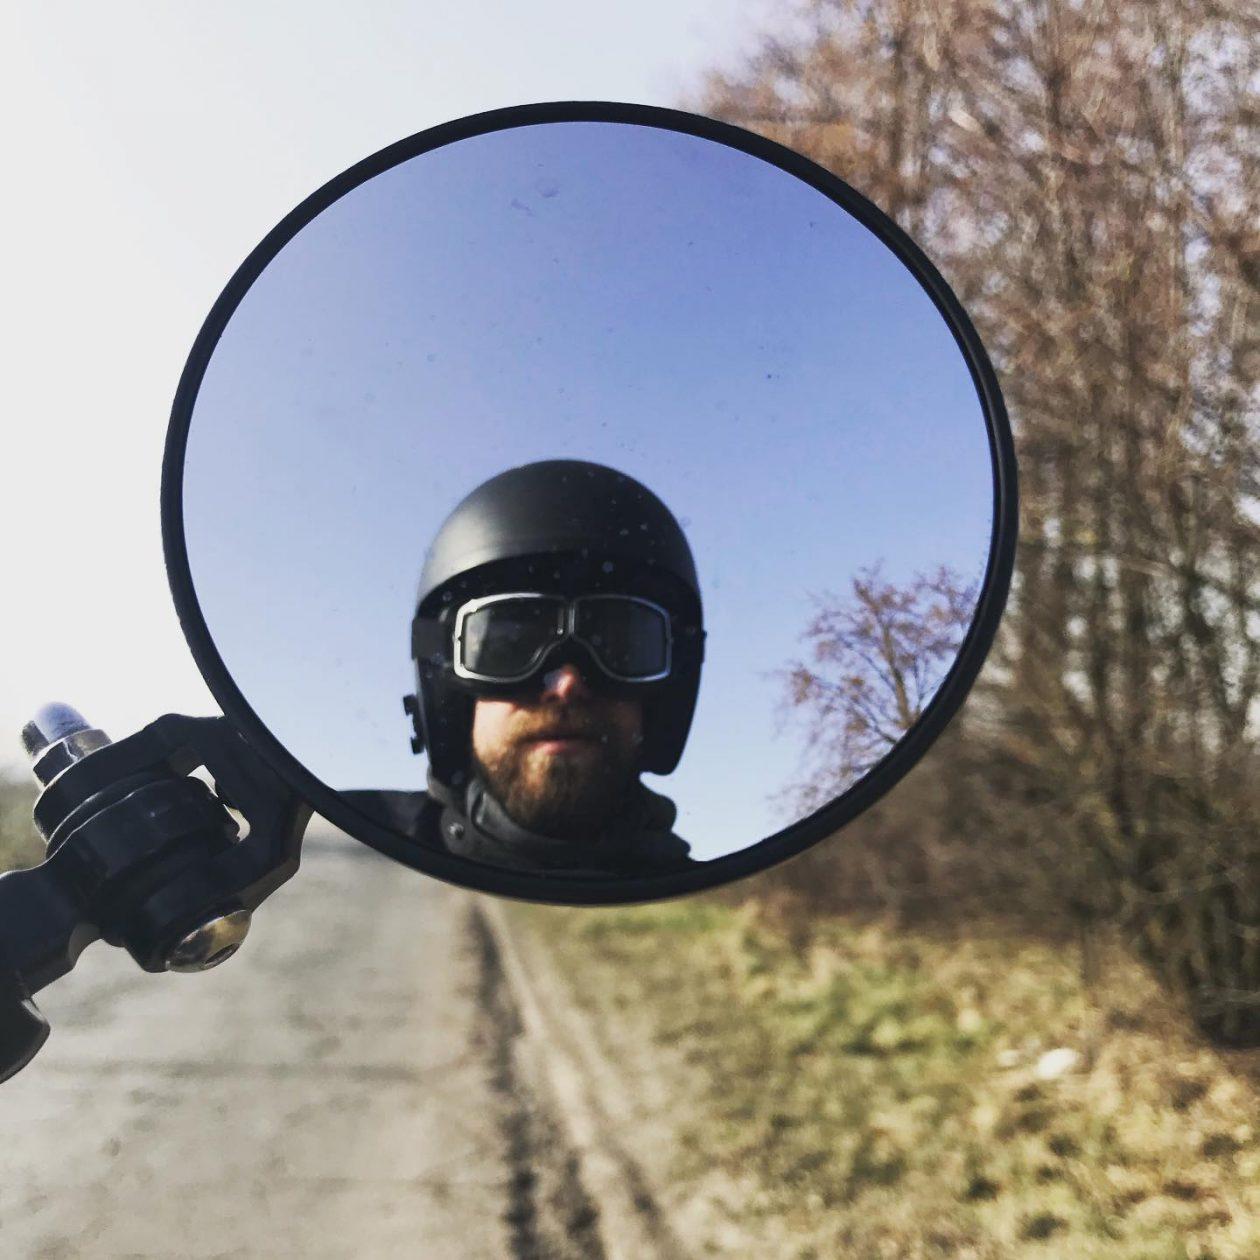 W Drodze #2 - Motocyklem doDęblina - mikro zlot Superlight